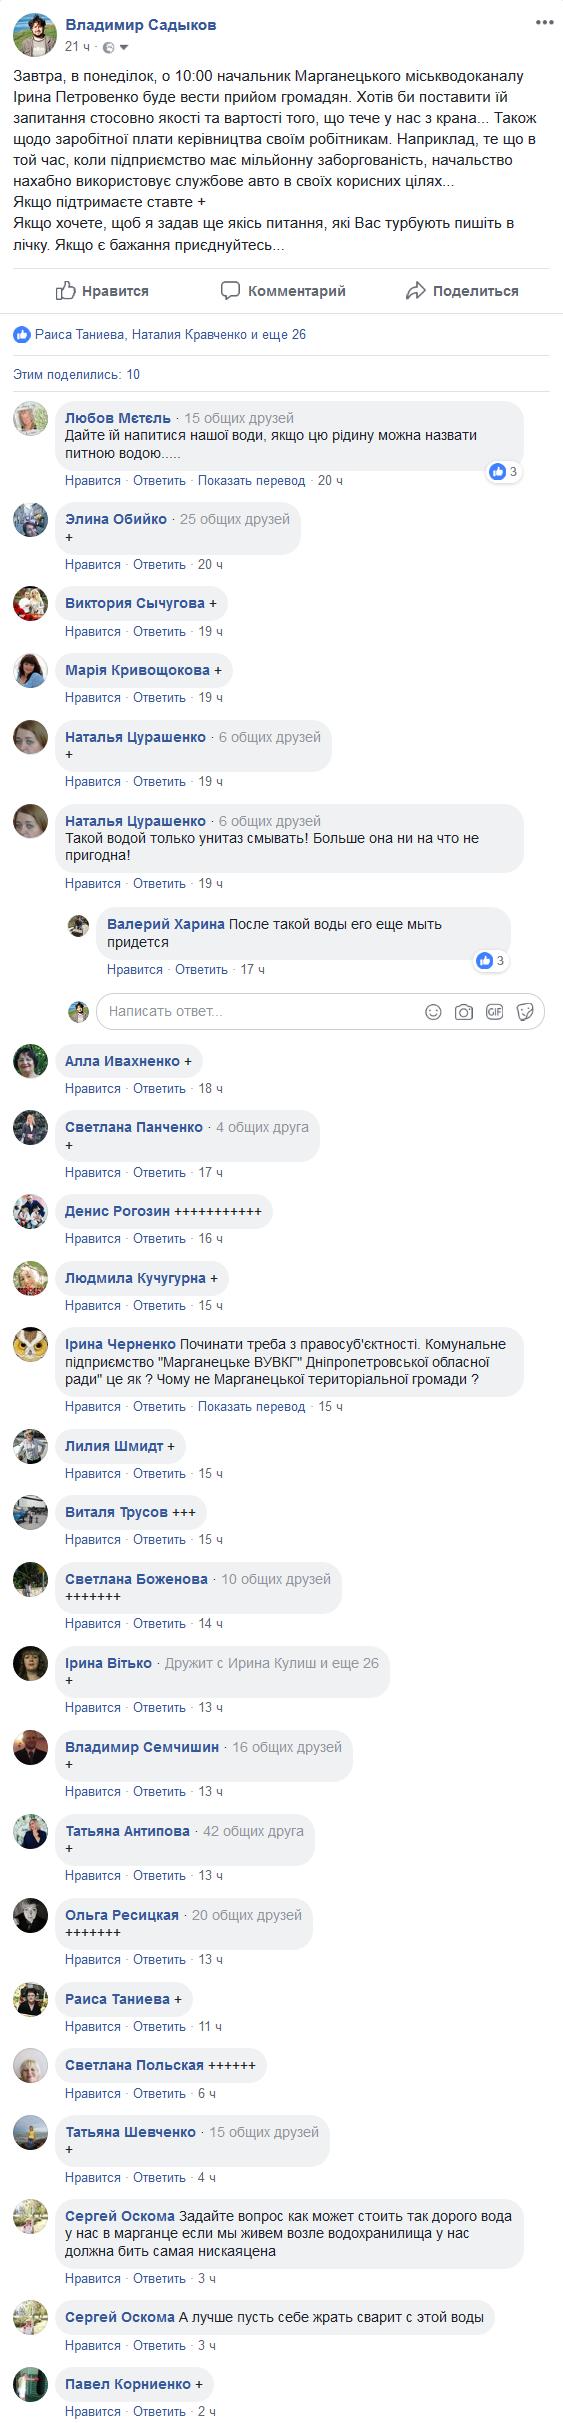 Screenshot-2018-5-21 (1) Владимир Садыков